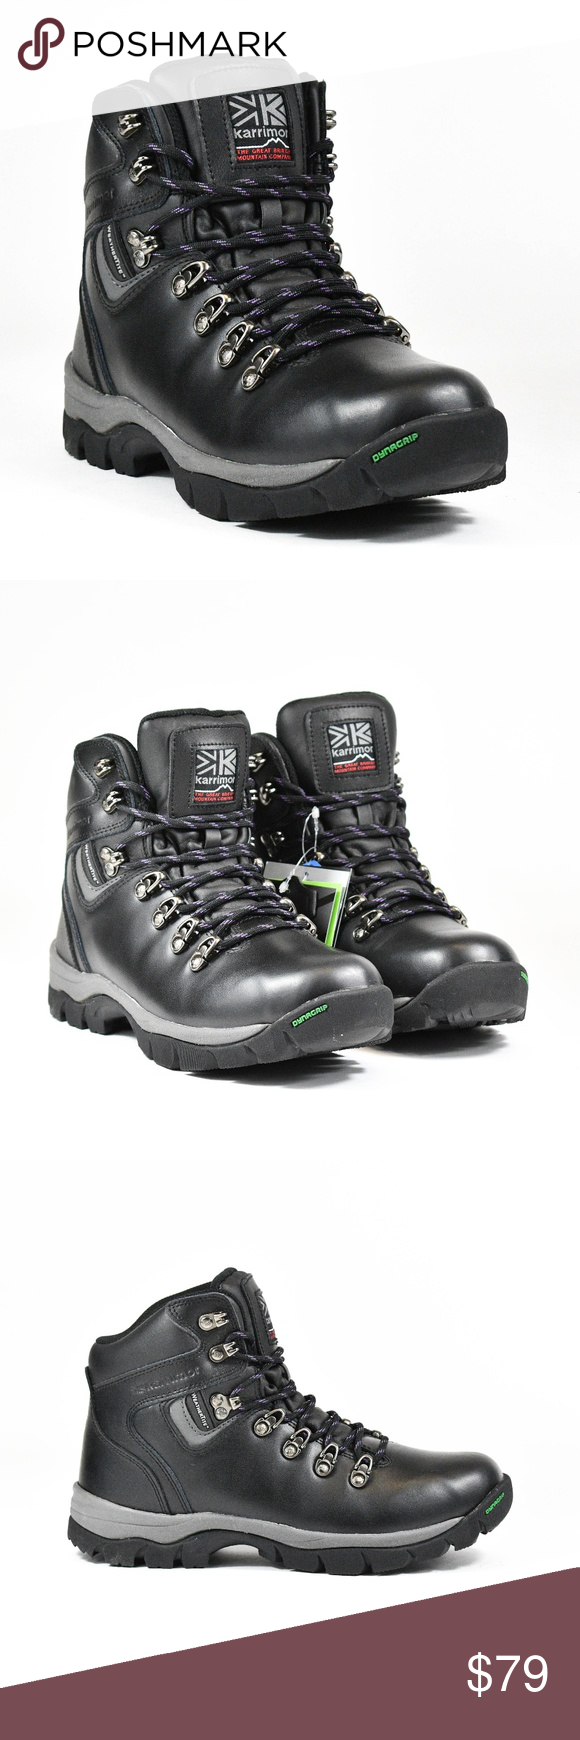 Karrimor Mens Skiddaw Walking Boots Breathable Waterproof Leather Upper Pattern